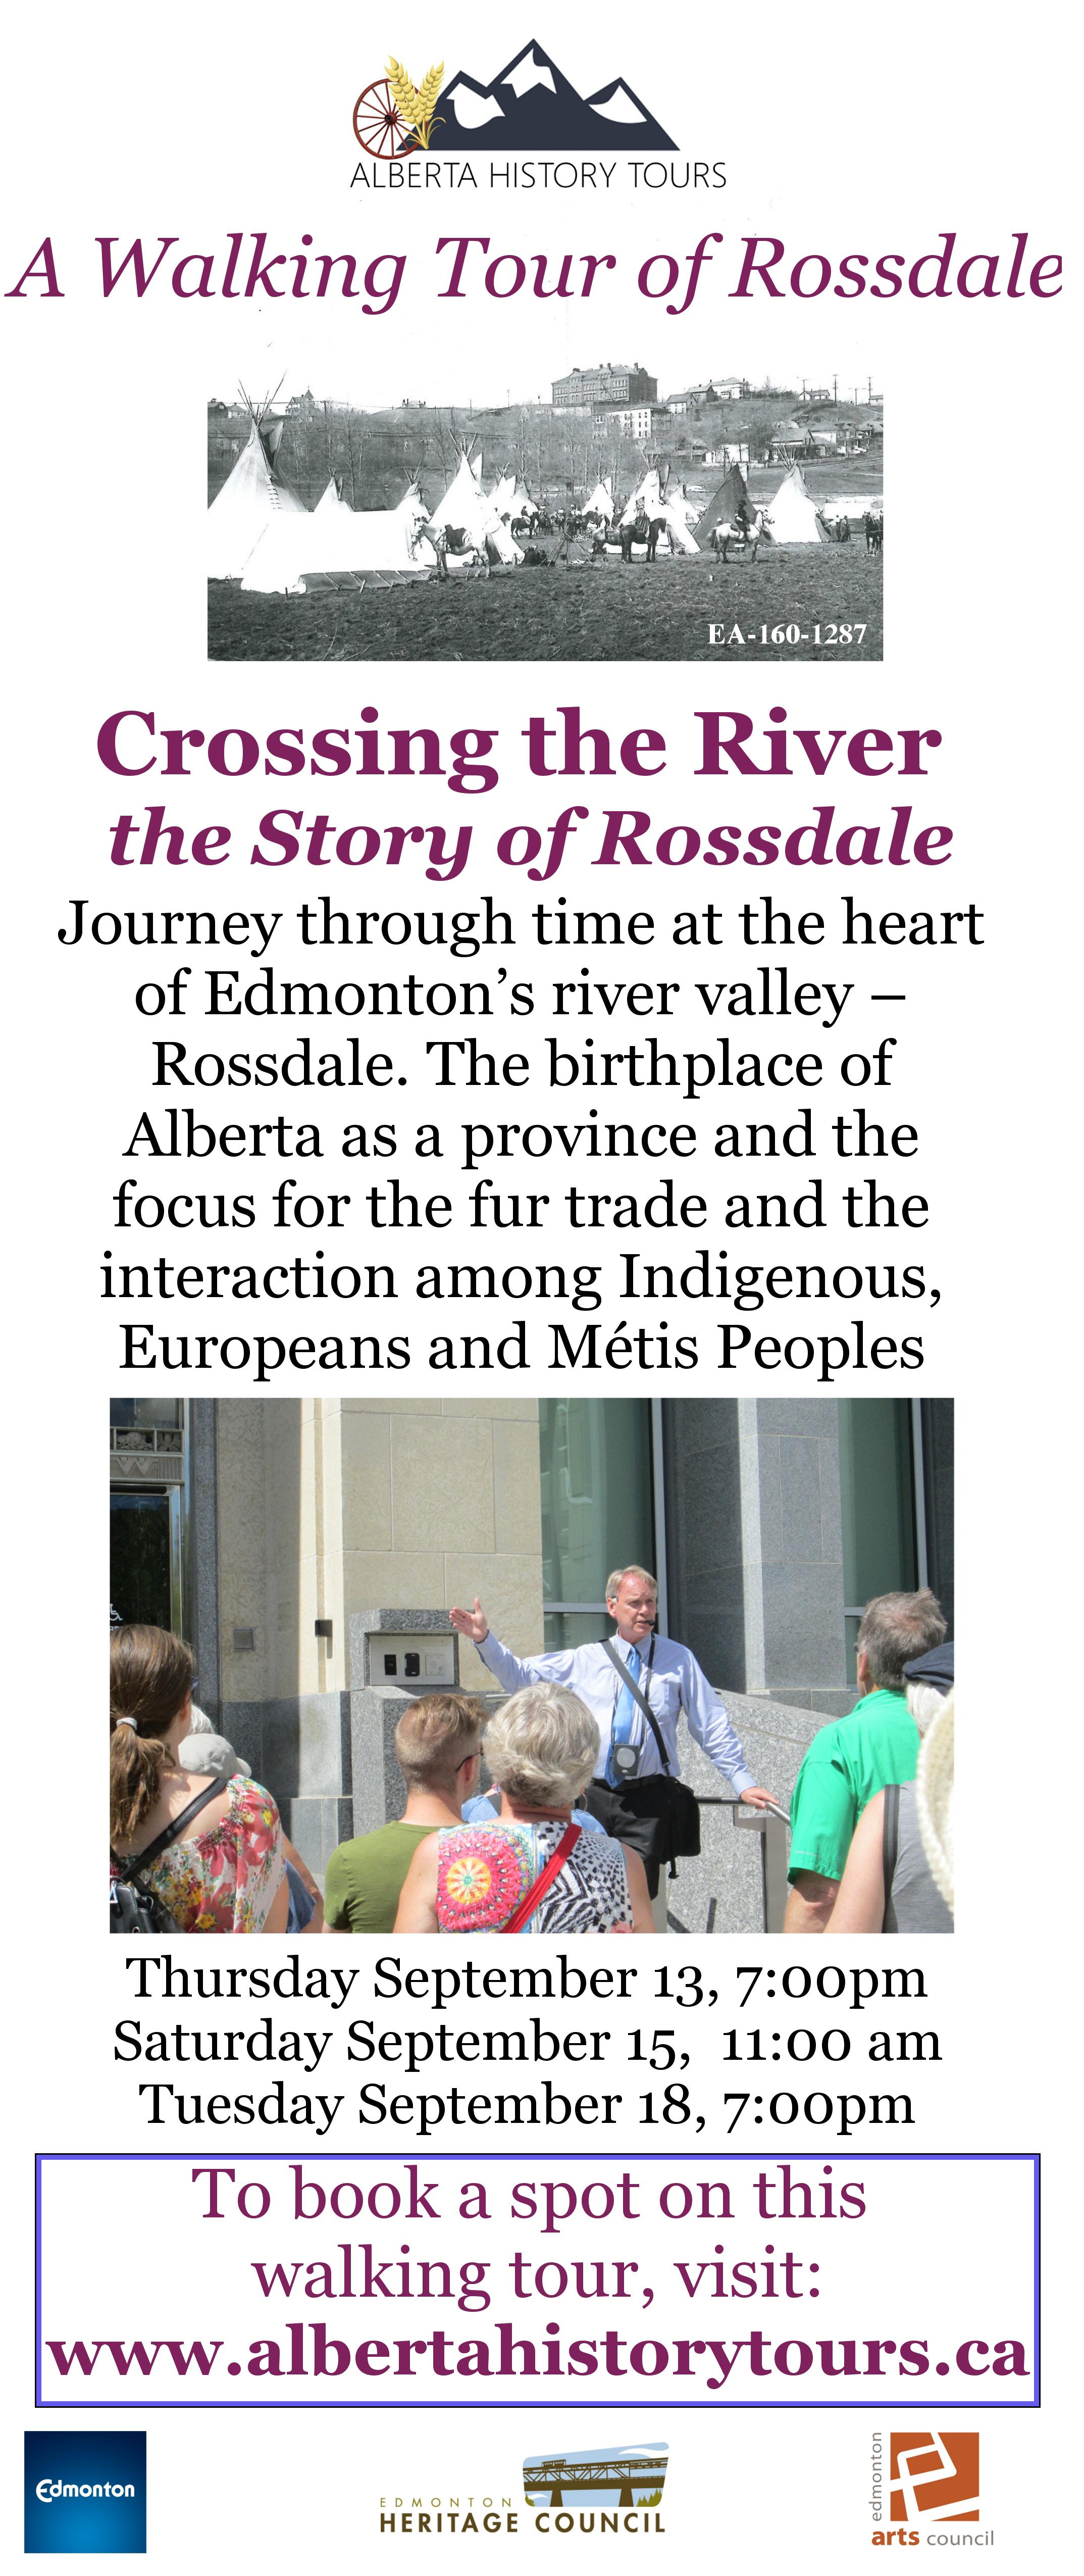 Alberta History Tour Flyer 1 UP.jpg